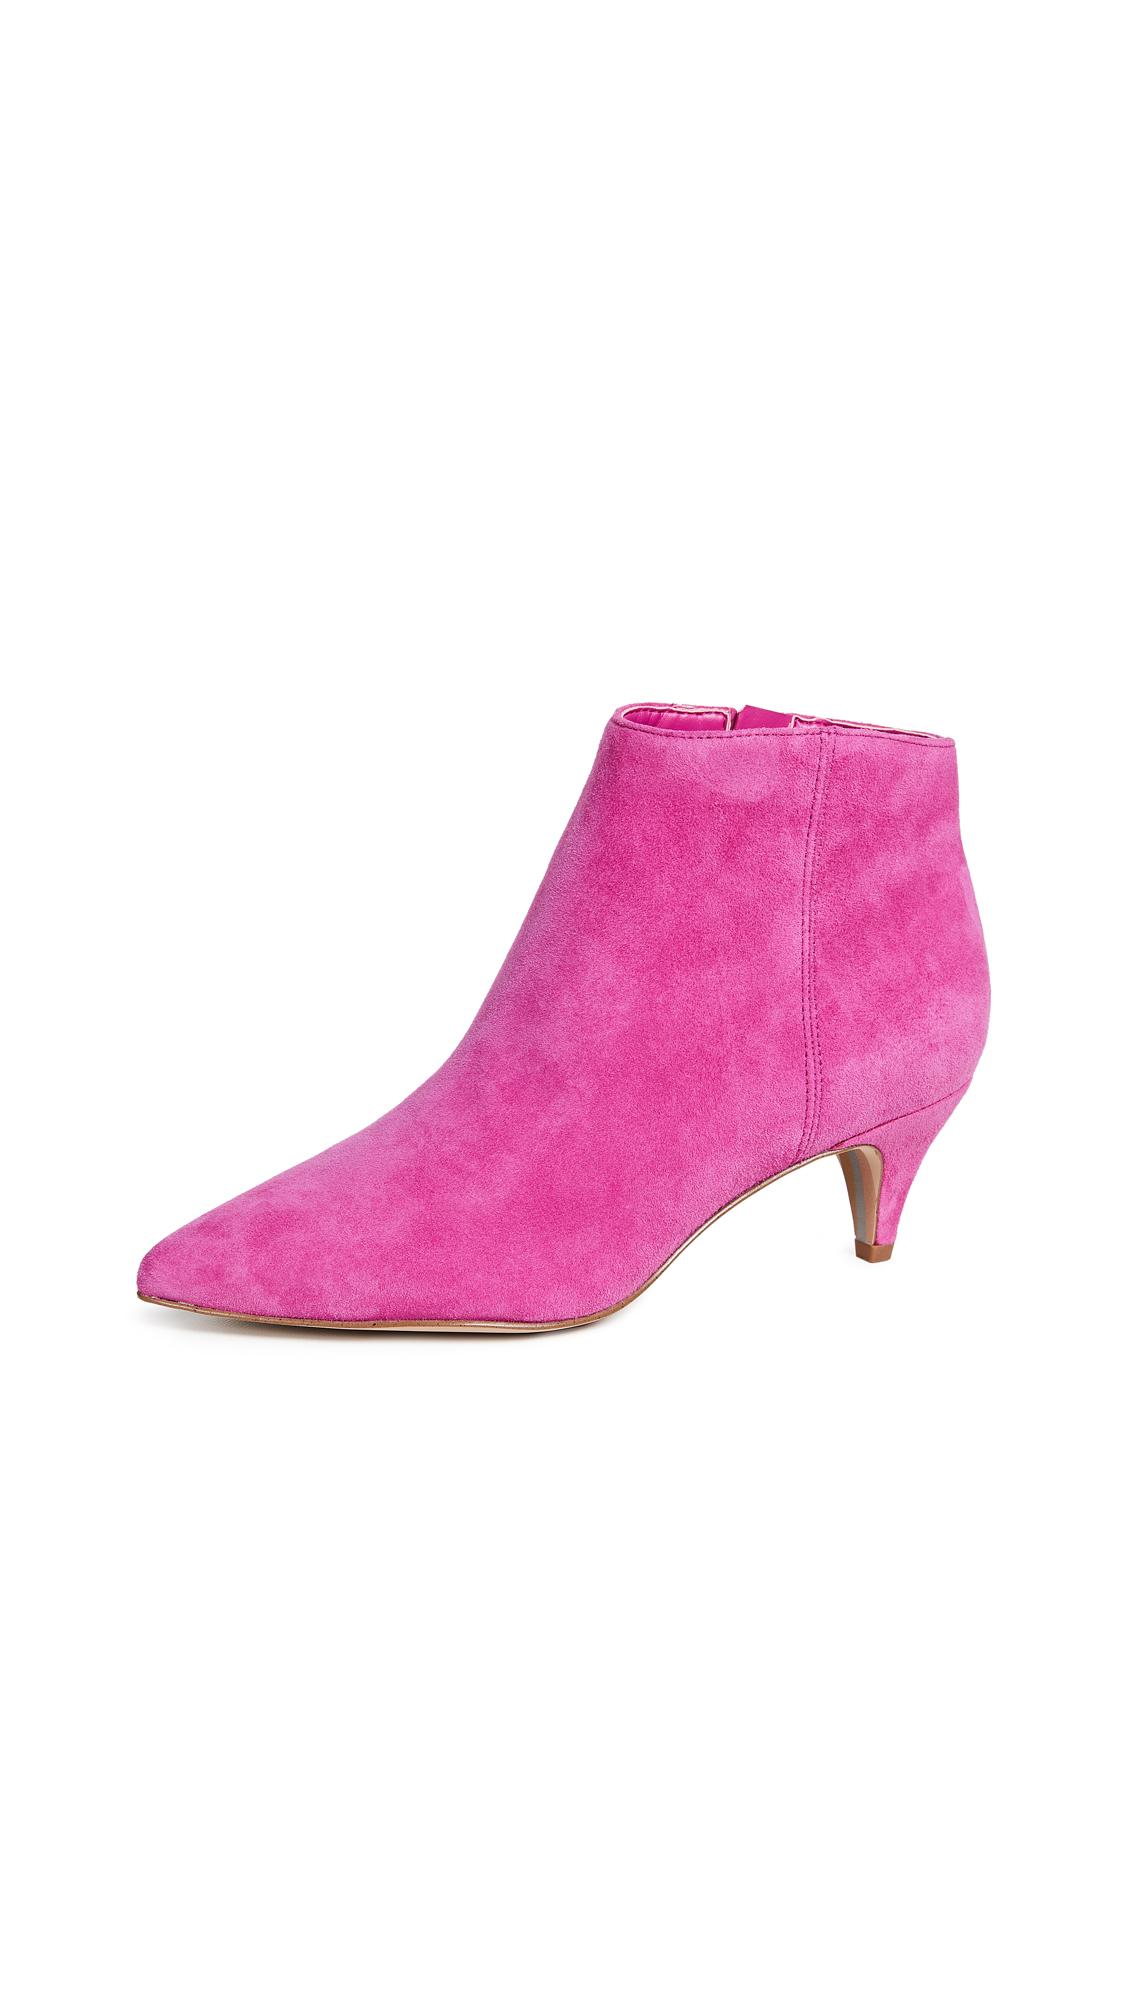 Sam Edelman Kinzey Booties - Retro Pink